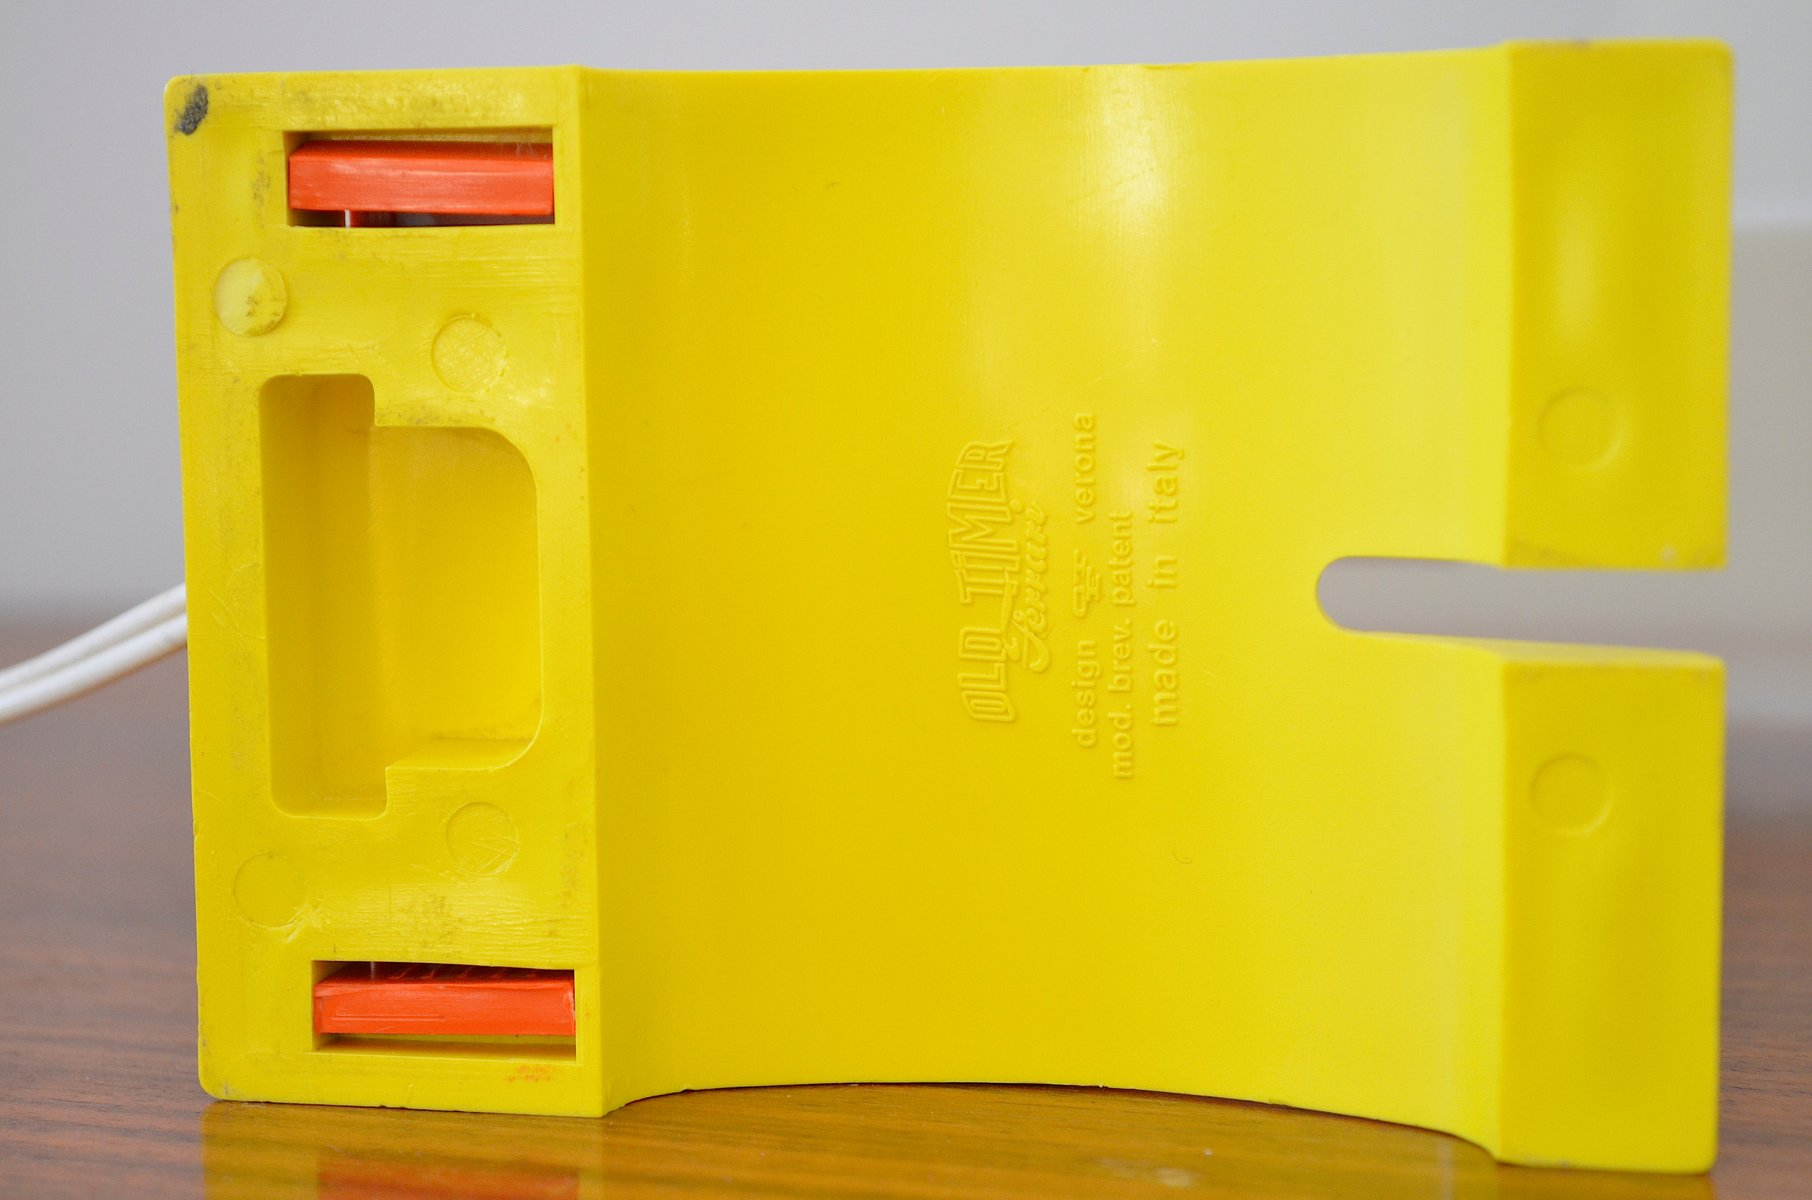 tukan lampe von otf ferrari italy 1960er bei pamono kaufen. Black Bedroom Furniture Sets. Home Design Ideas